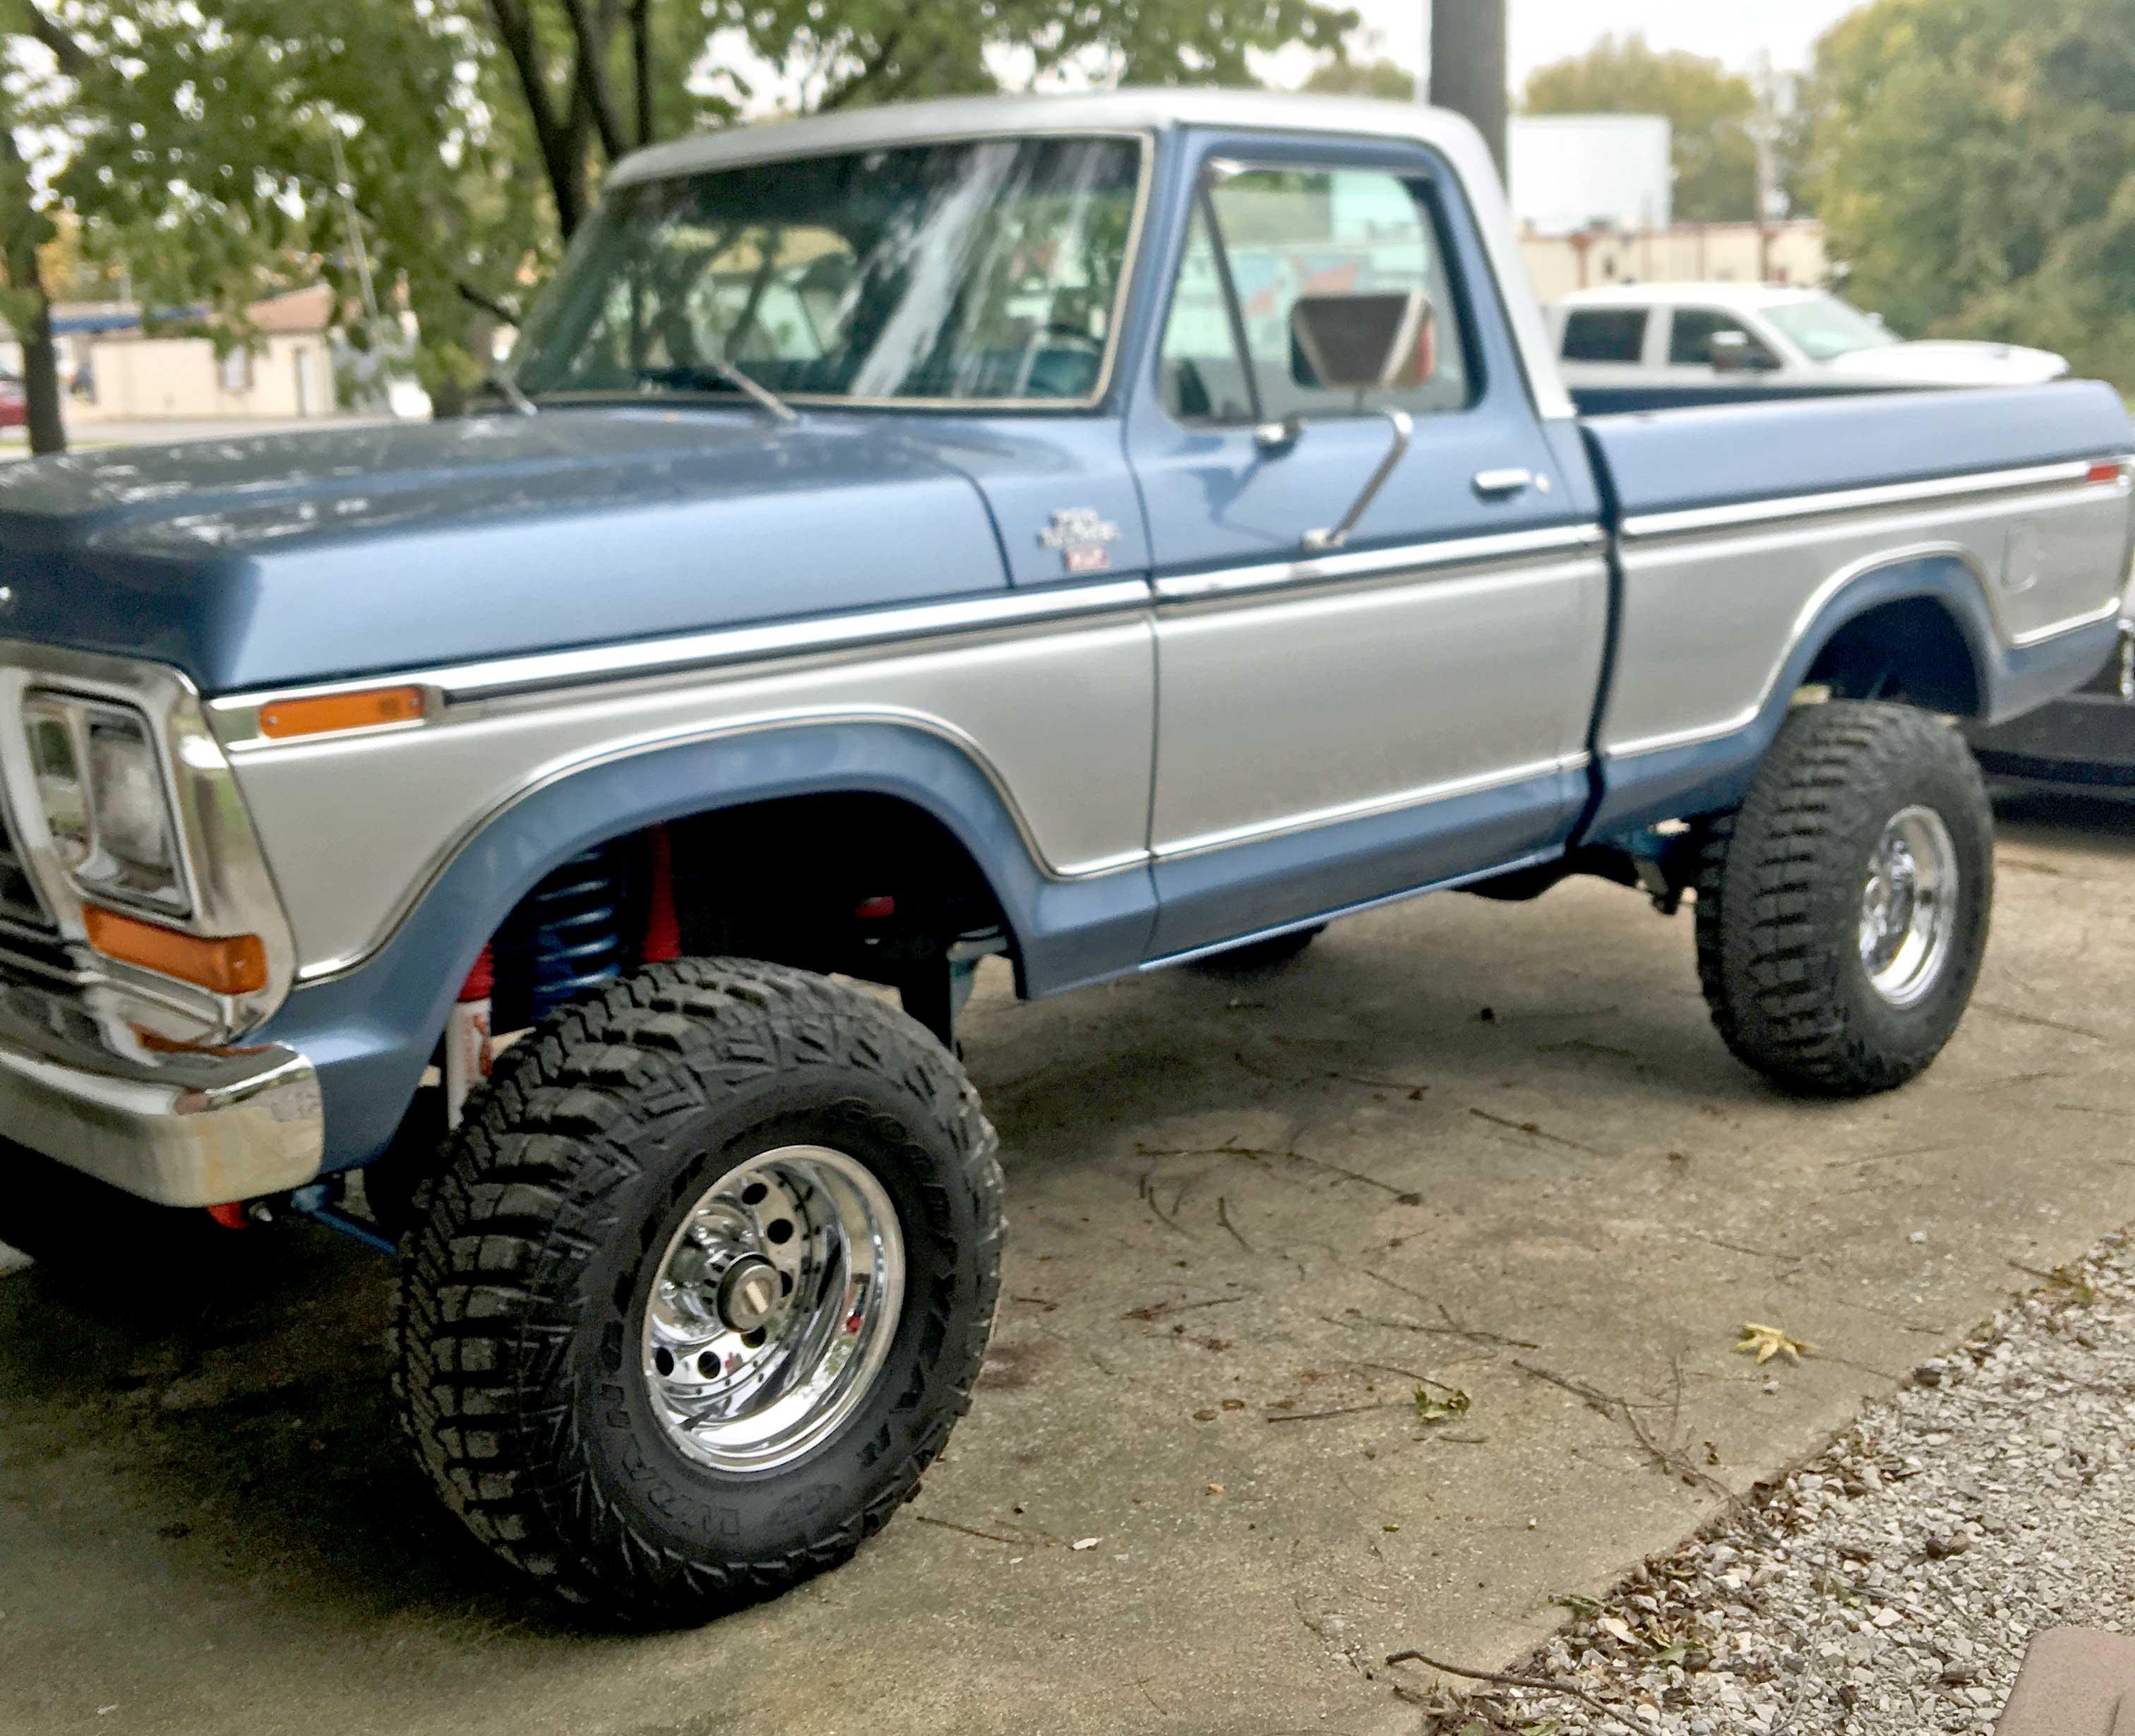 Lot 34 - 1979 Ford F150 Ranger XLT 4 wheel drive. 149,000 miles. Vin# F14HUEJ6006